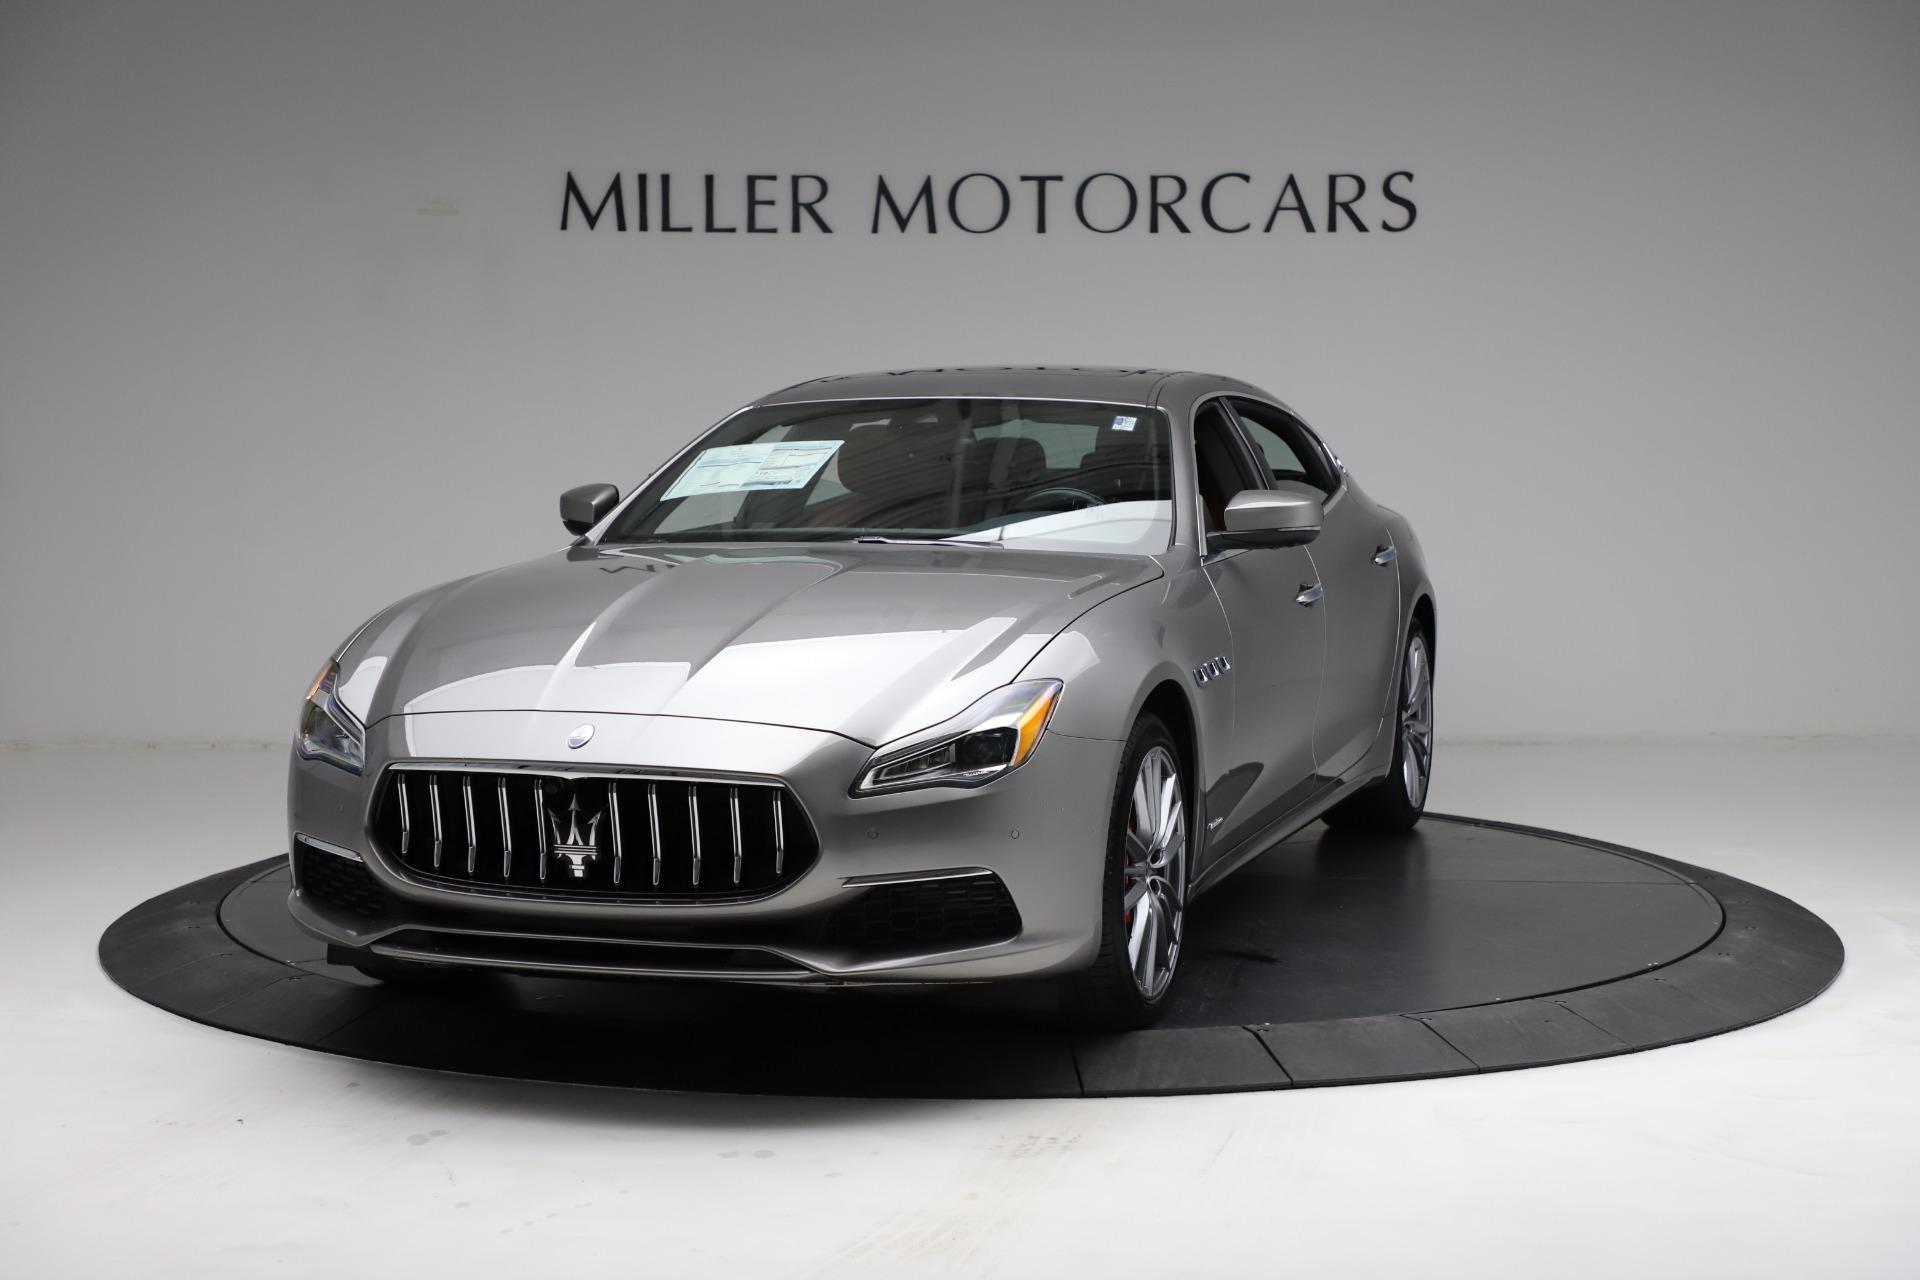 New 2021 Maserati Quattroporte S Q4 GranLusso for sale $122,435 at Bentley Greenwich in Greenwich CT 06830 1